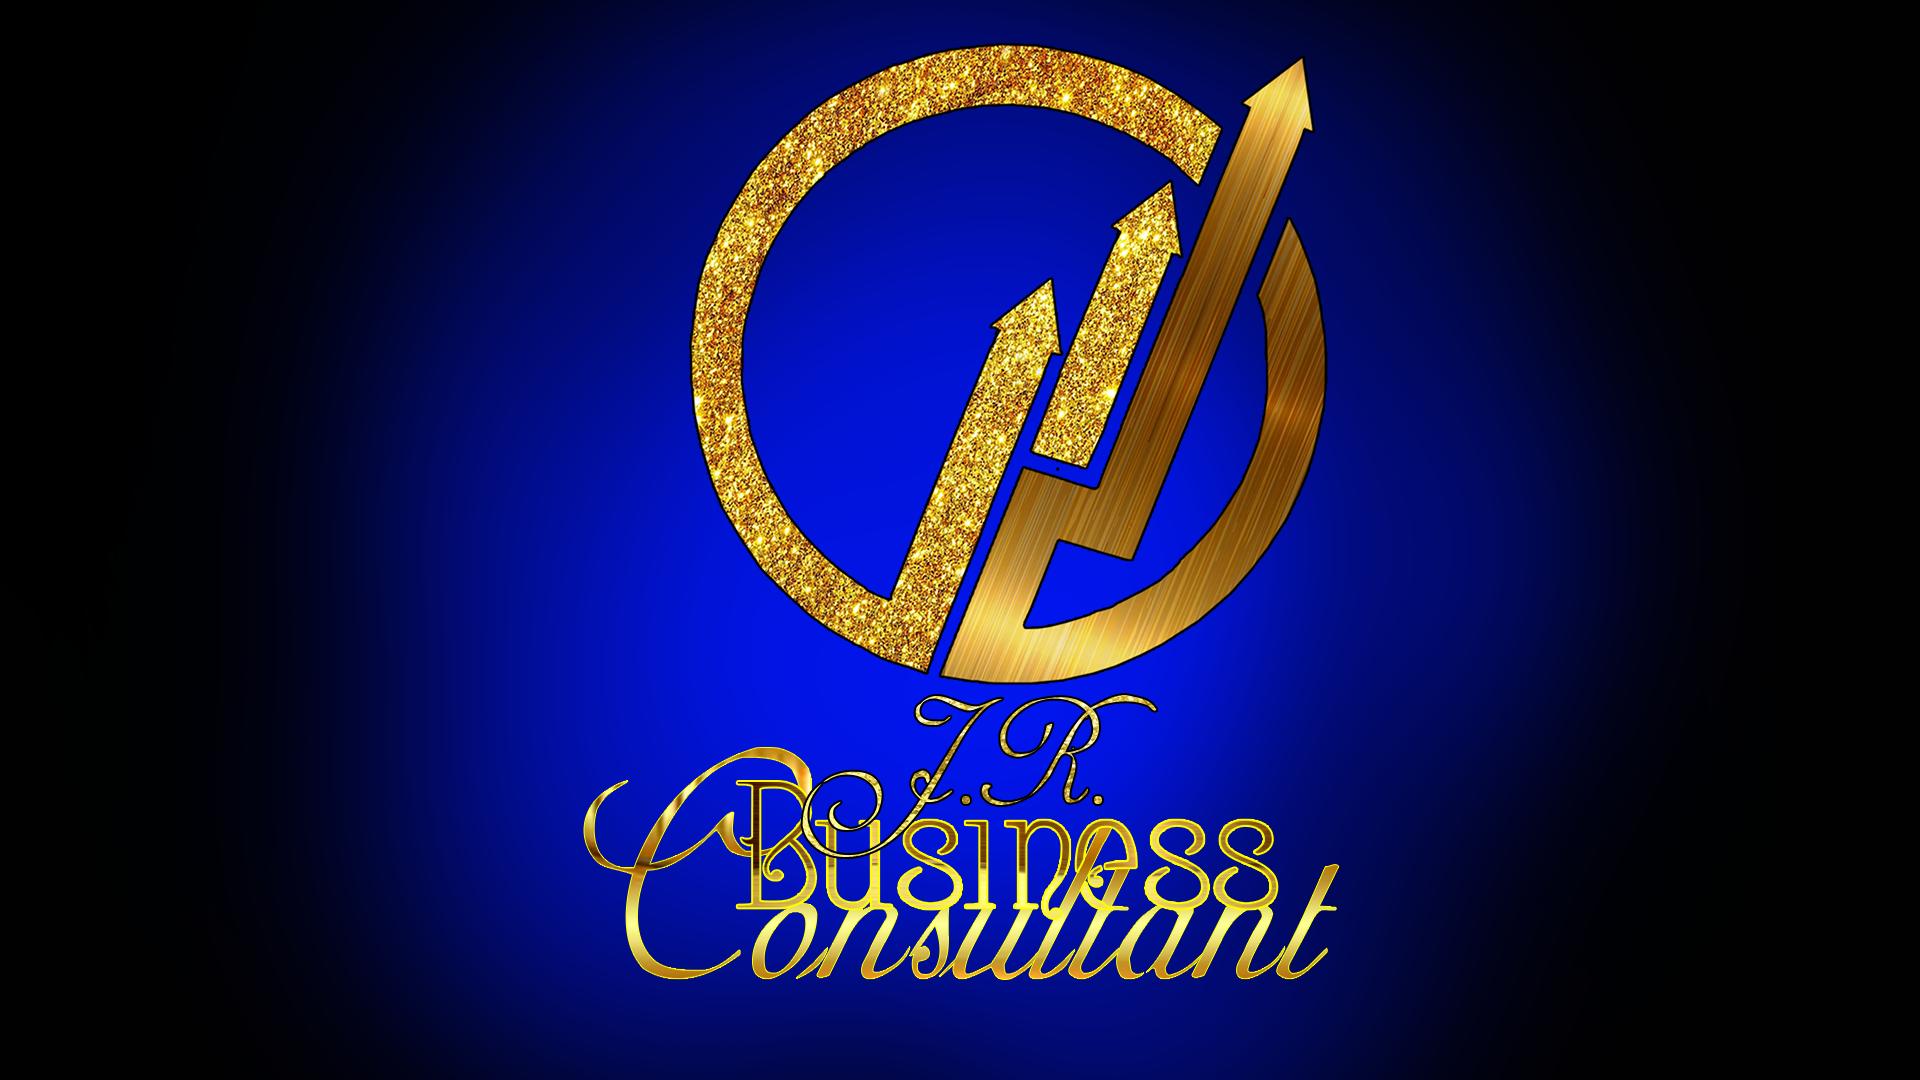 J.R. Business Consultant